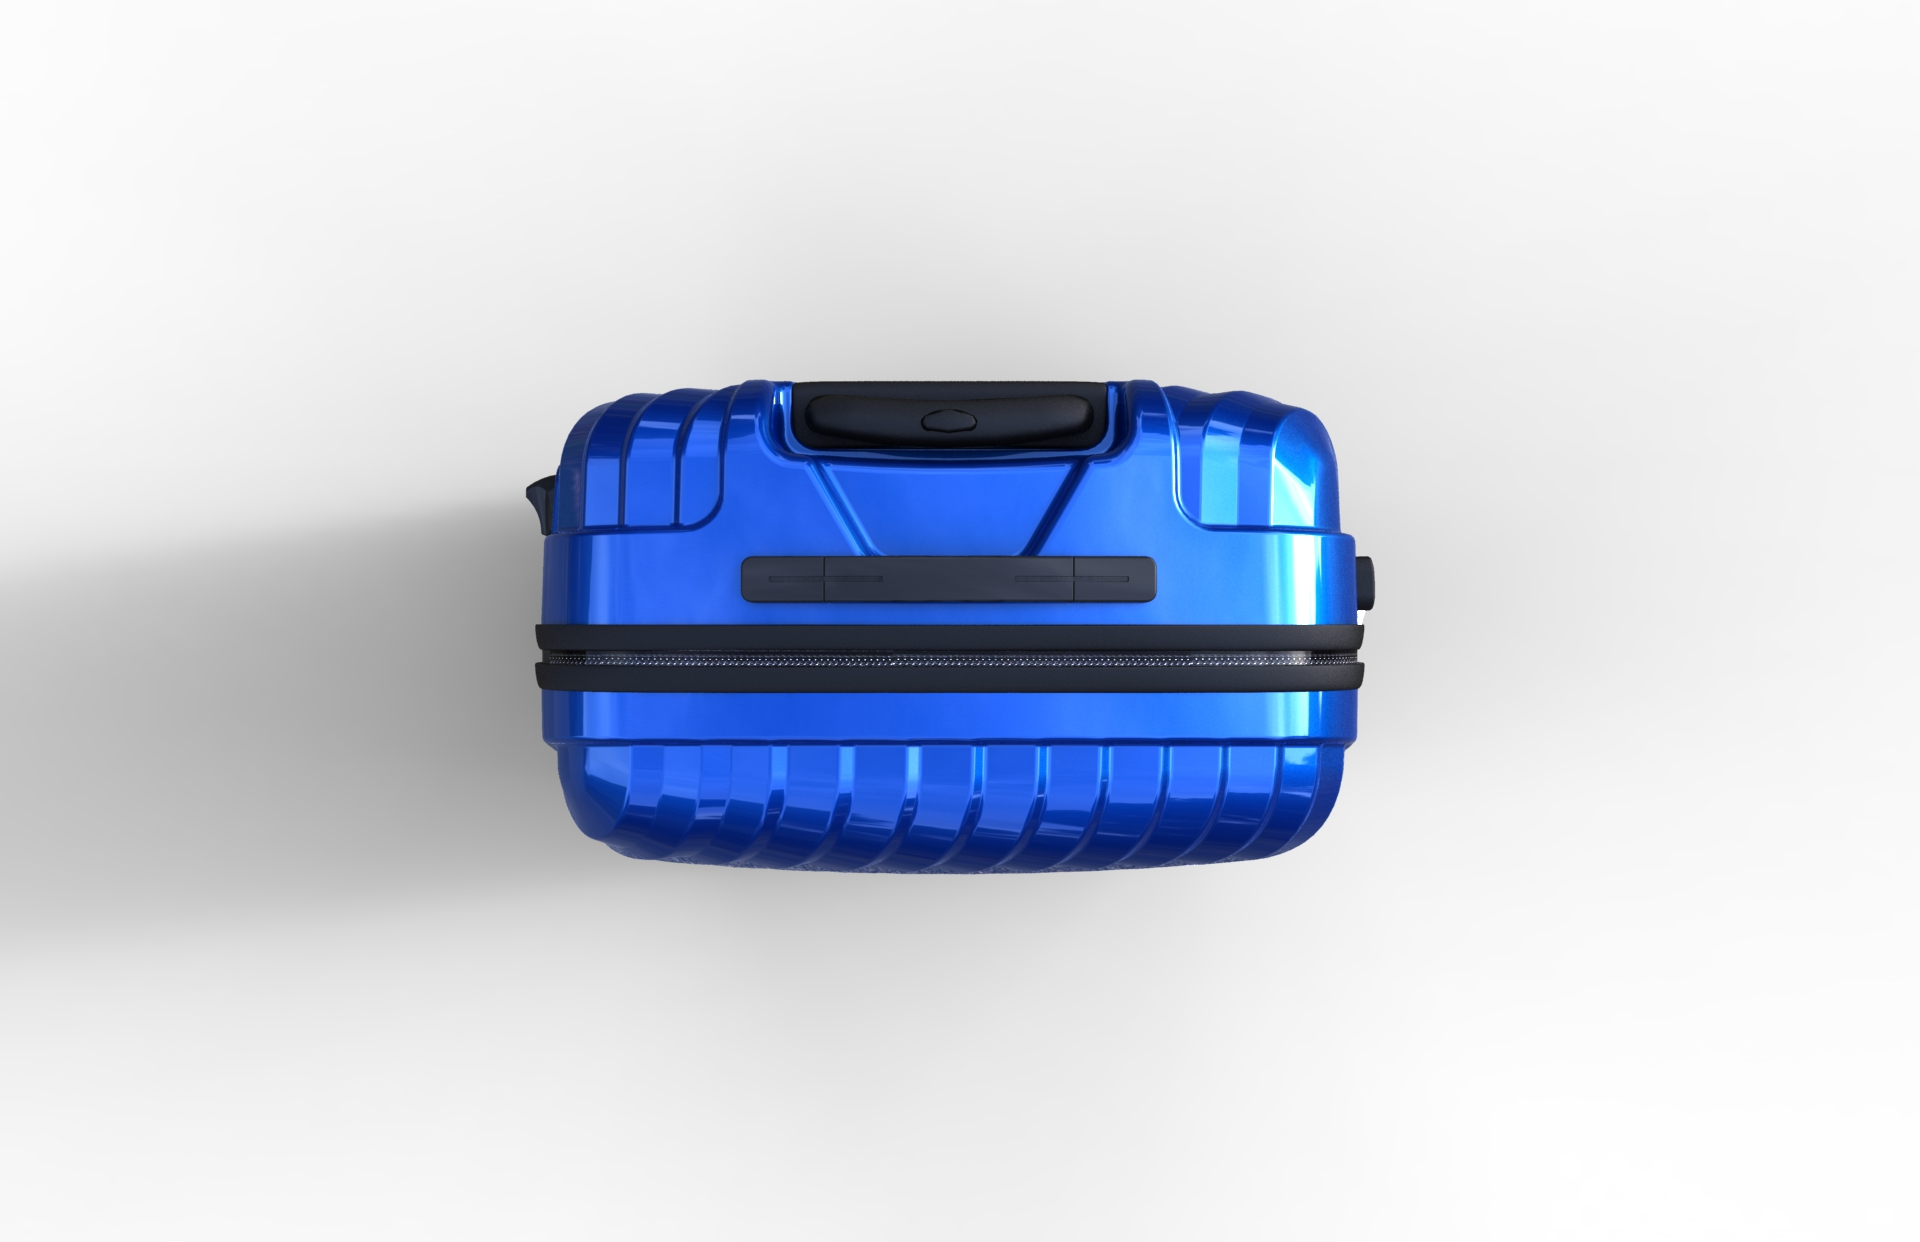 Trolley Suitcase Bag 03